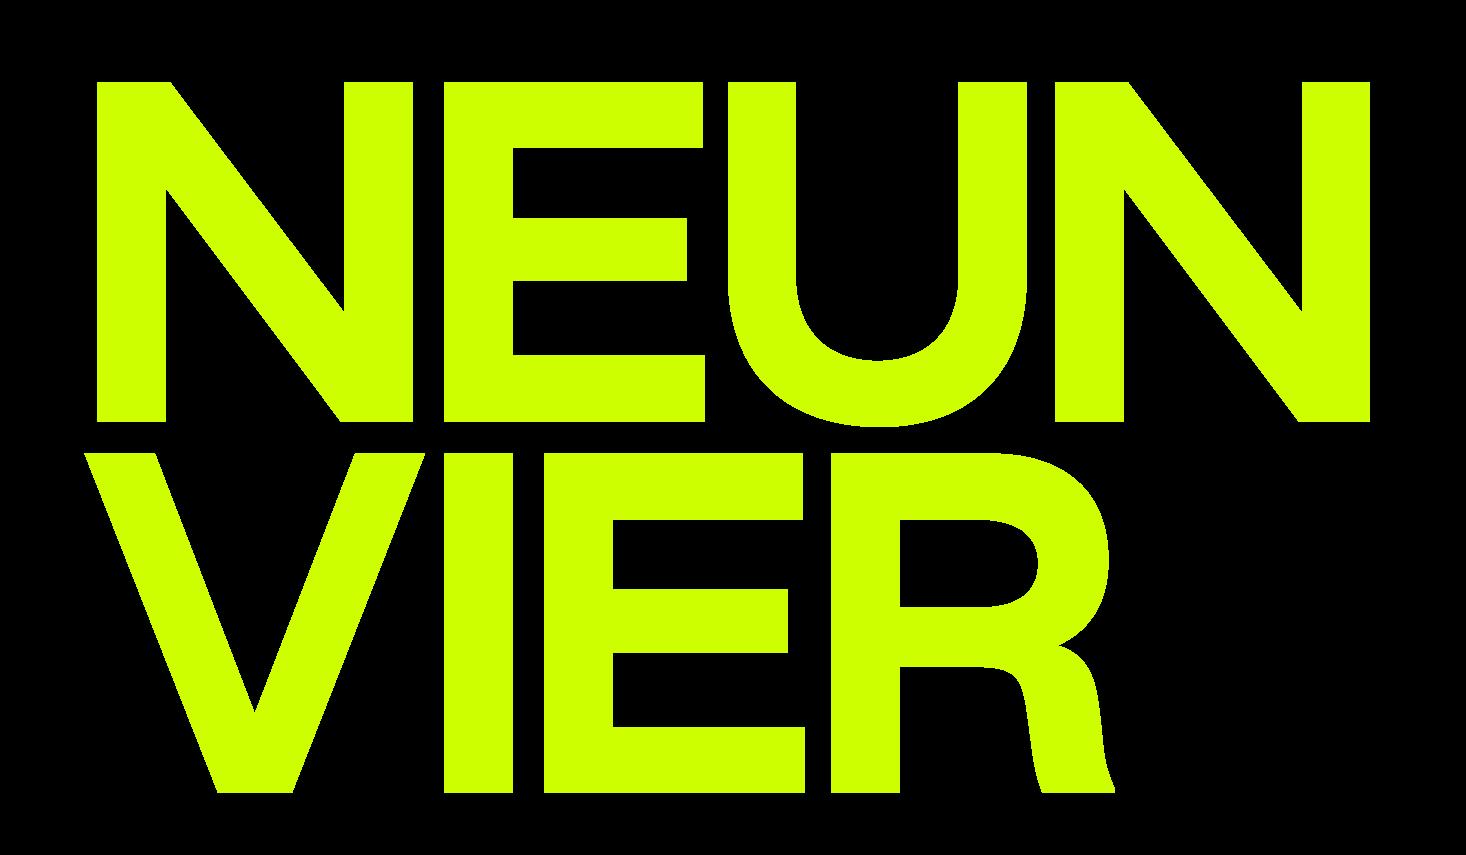 NeunVier